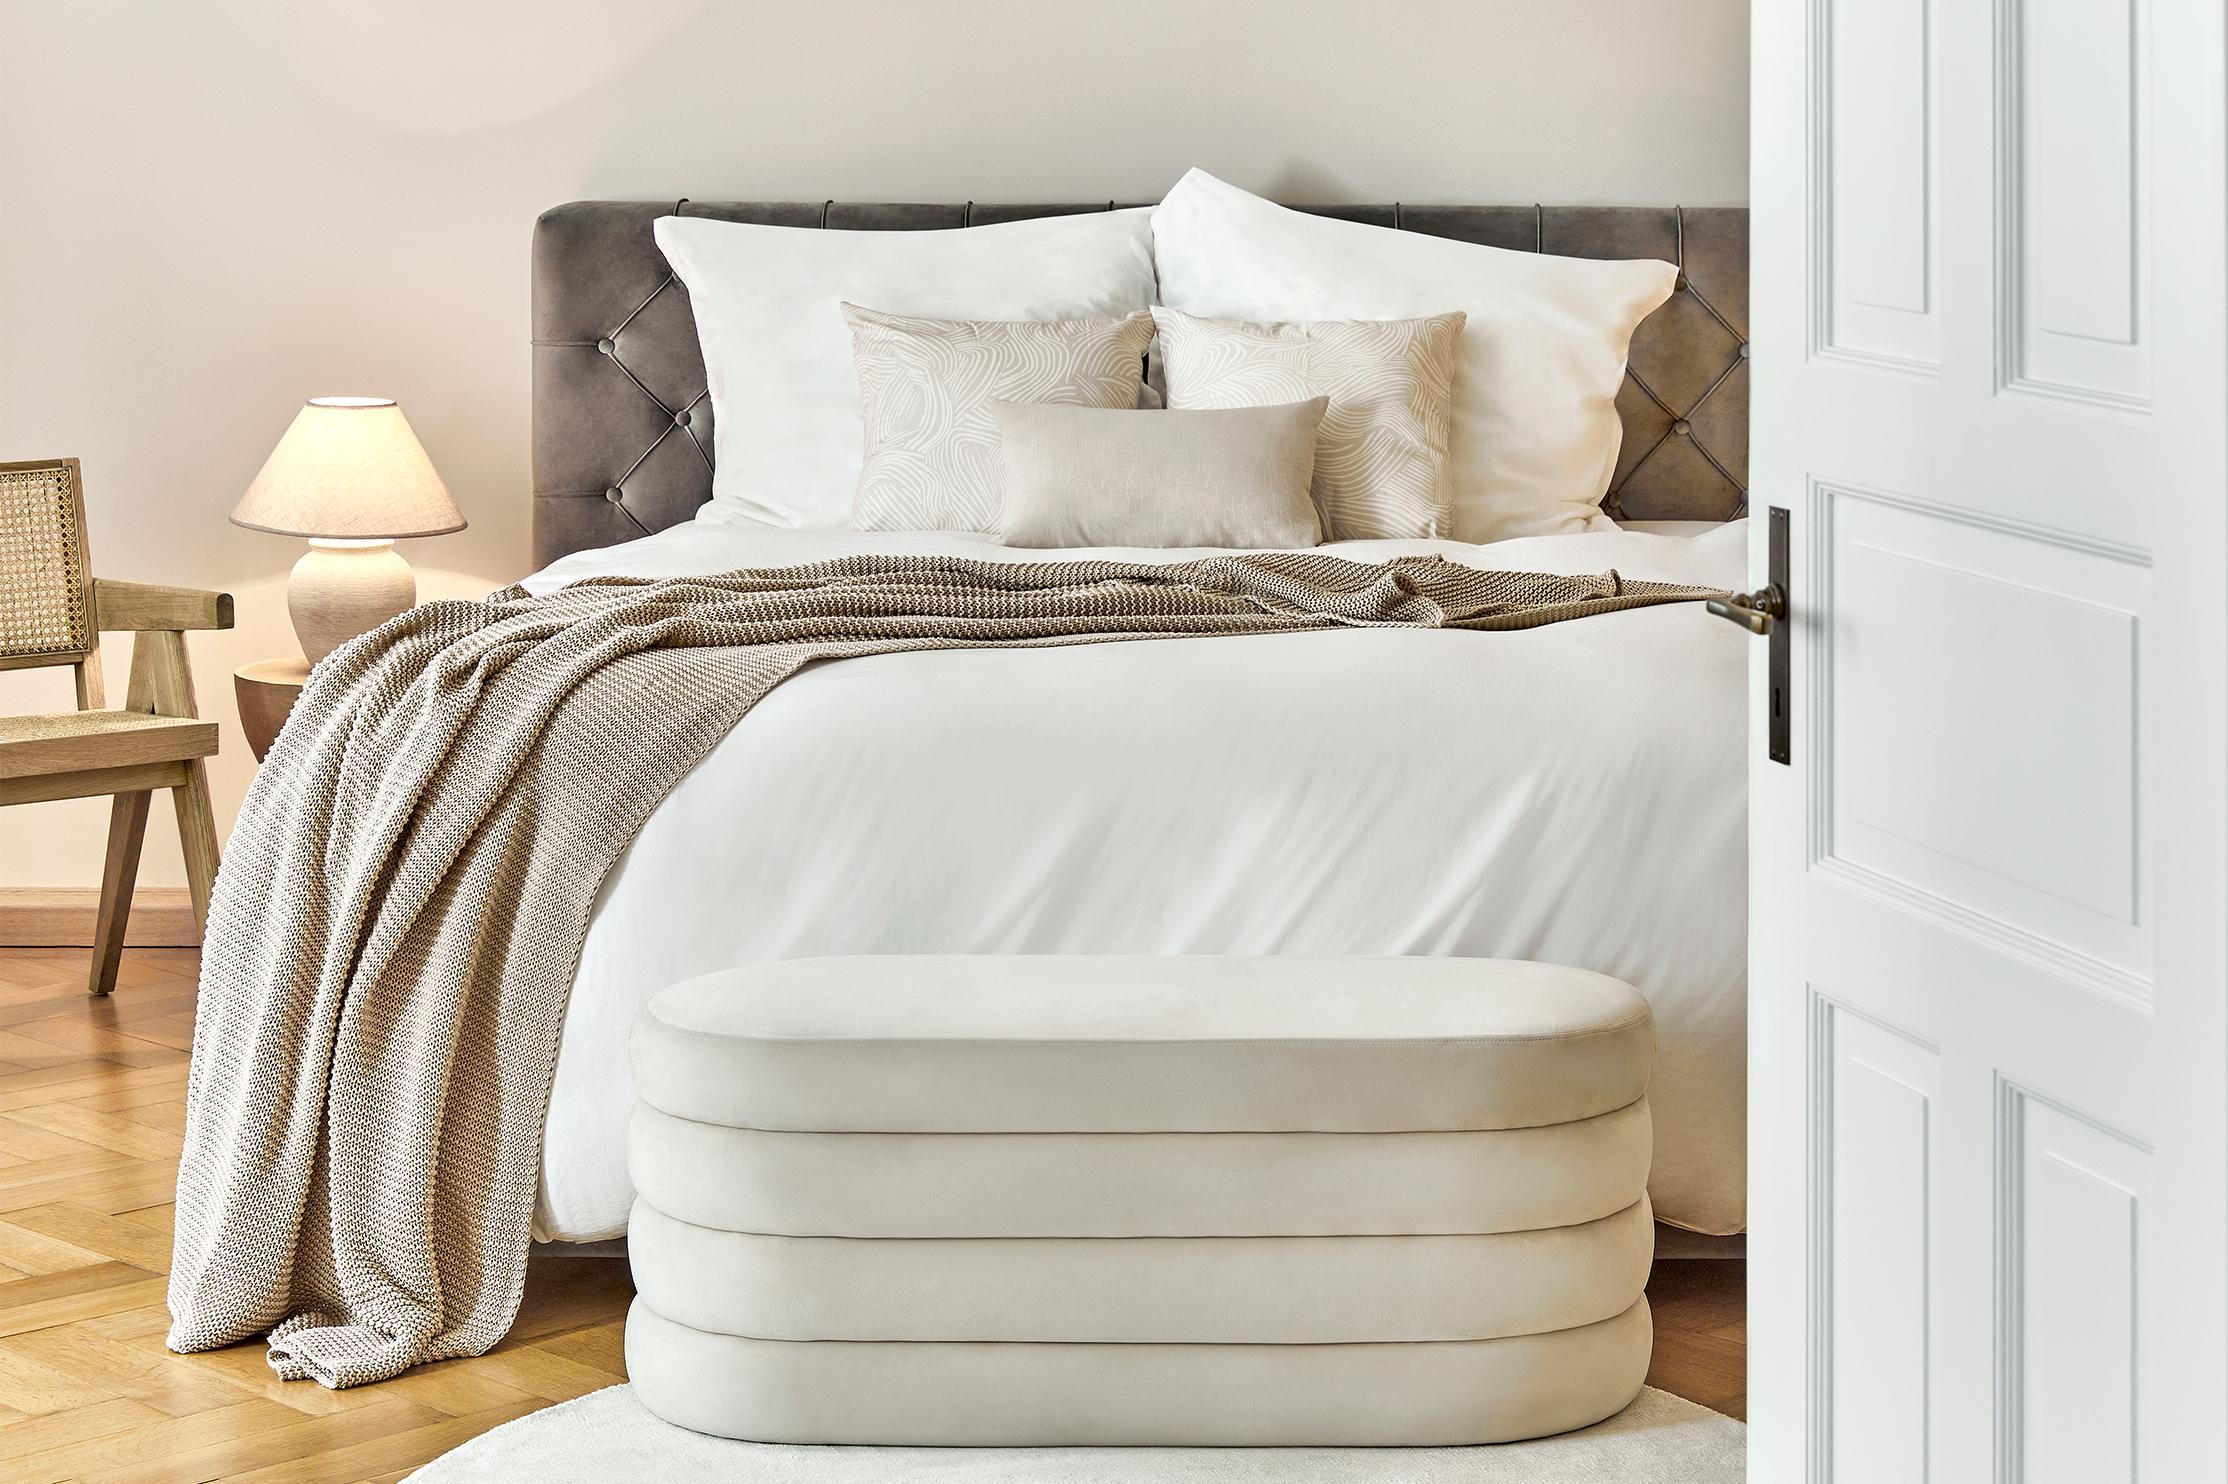 Komfort i luksus